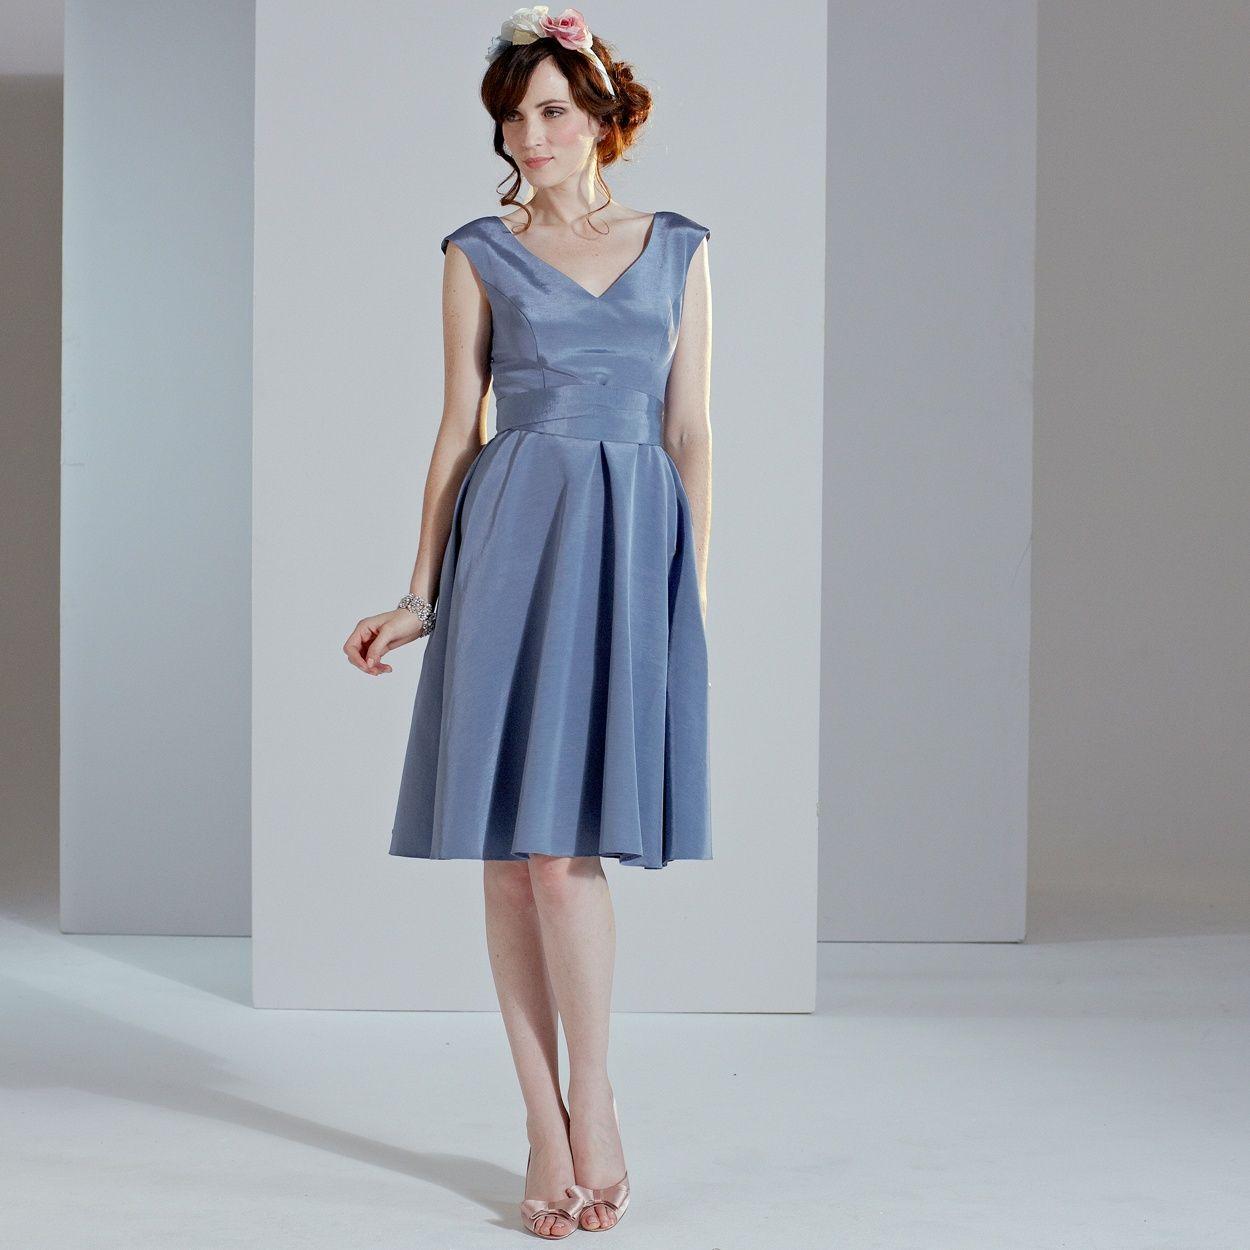 Awesome Bridesmaid Dress Debenhams Contemporary - Wedding Ideas ...